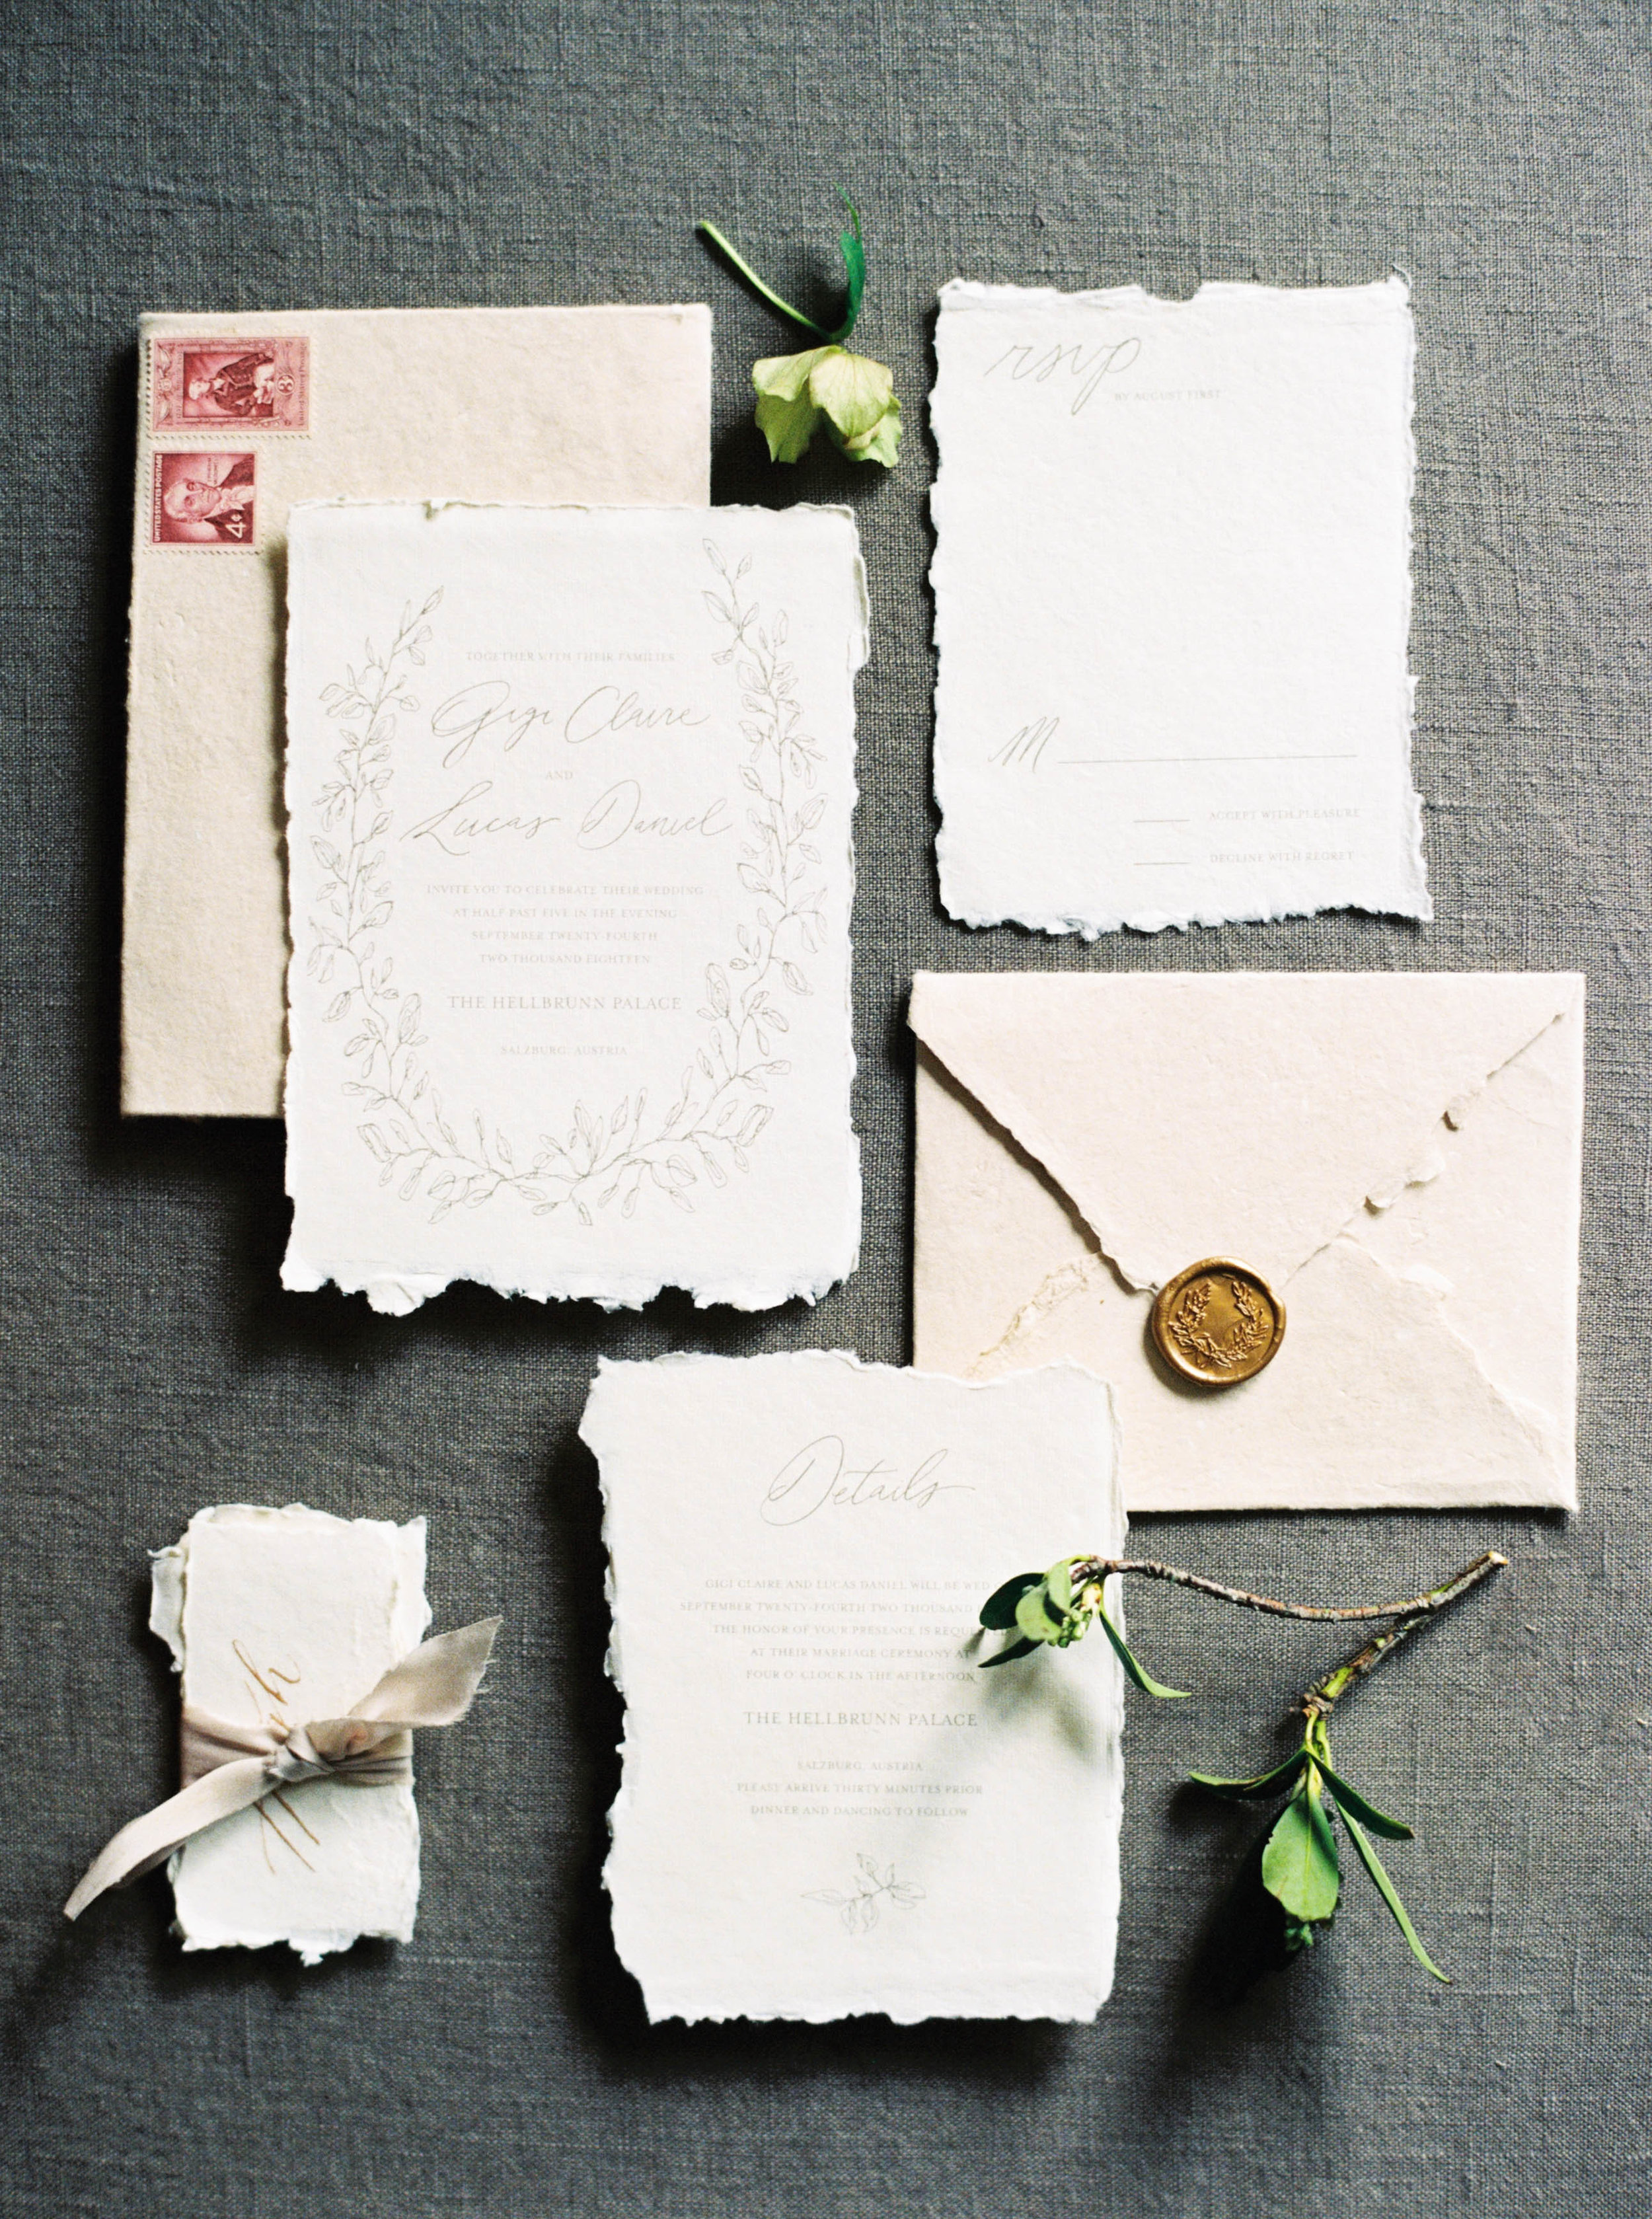 ink&pressco-mikylamanu-wedding-calligraphy-10-unearthing.tc.jpg